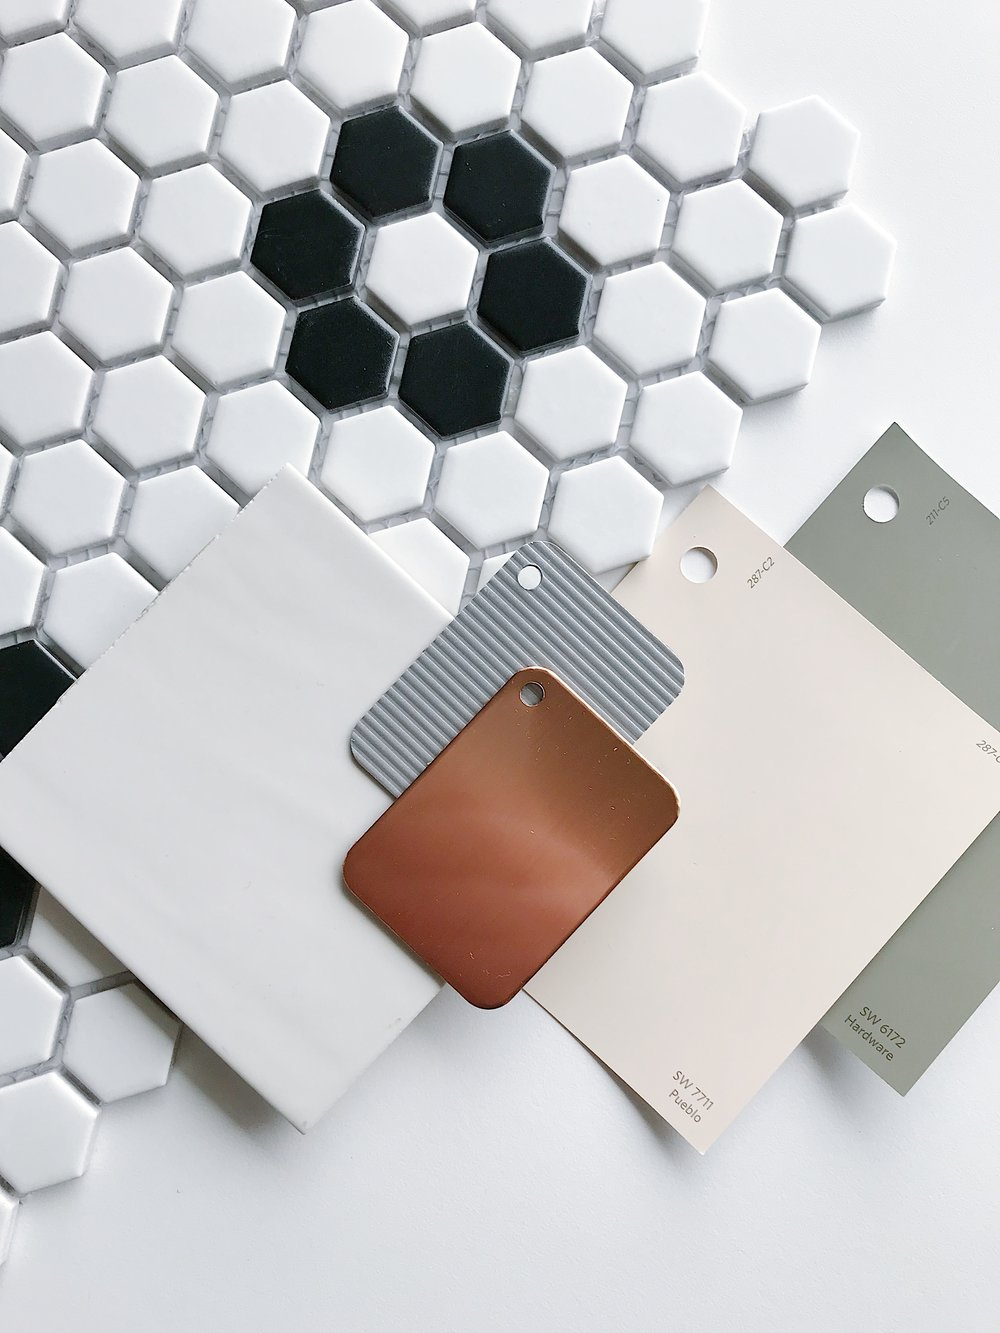 detroit interior design materials palette